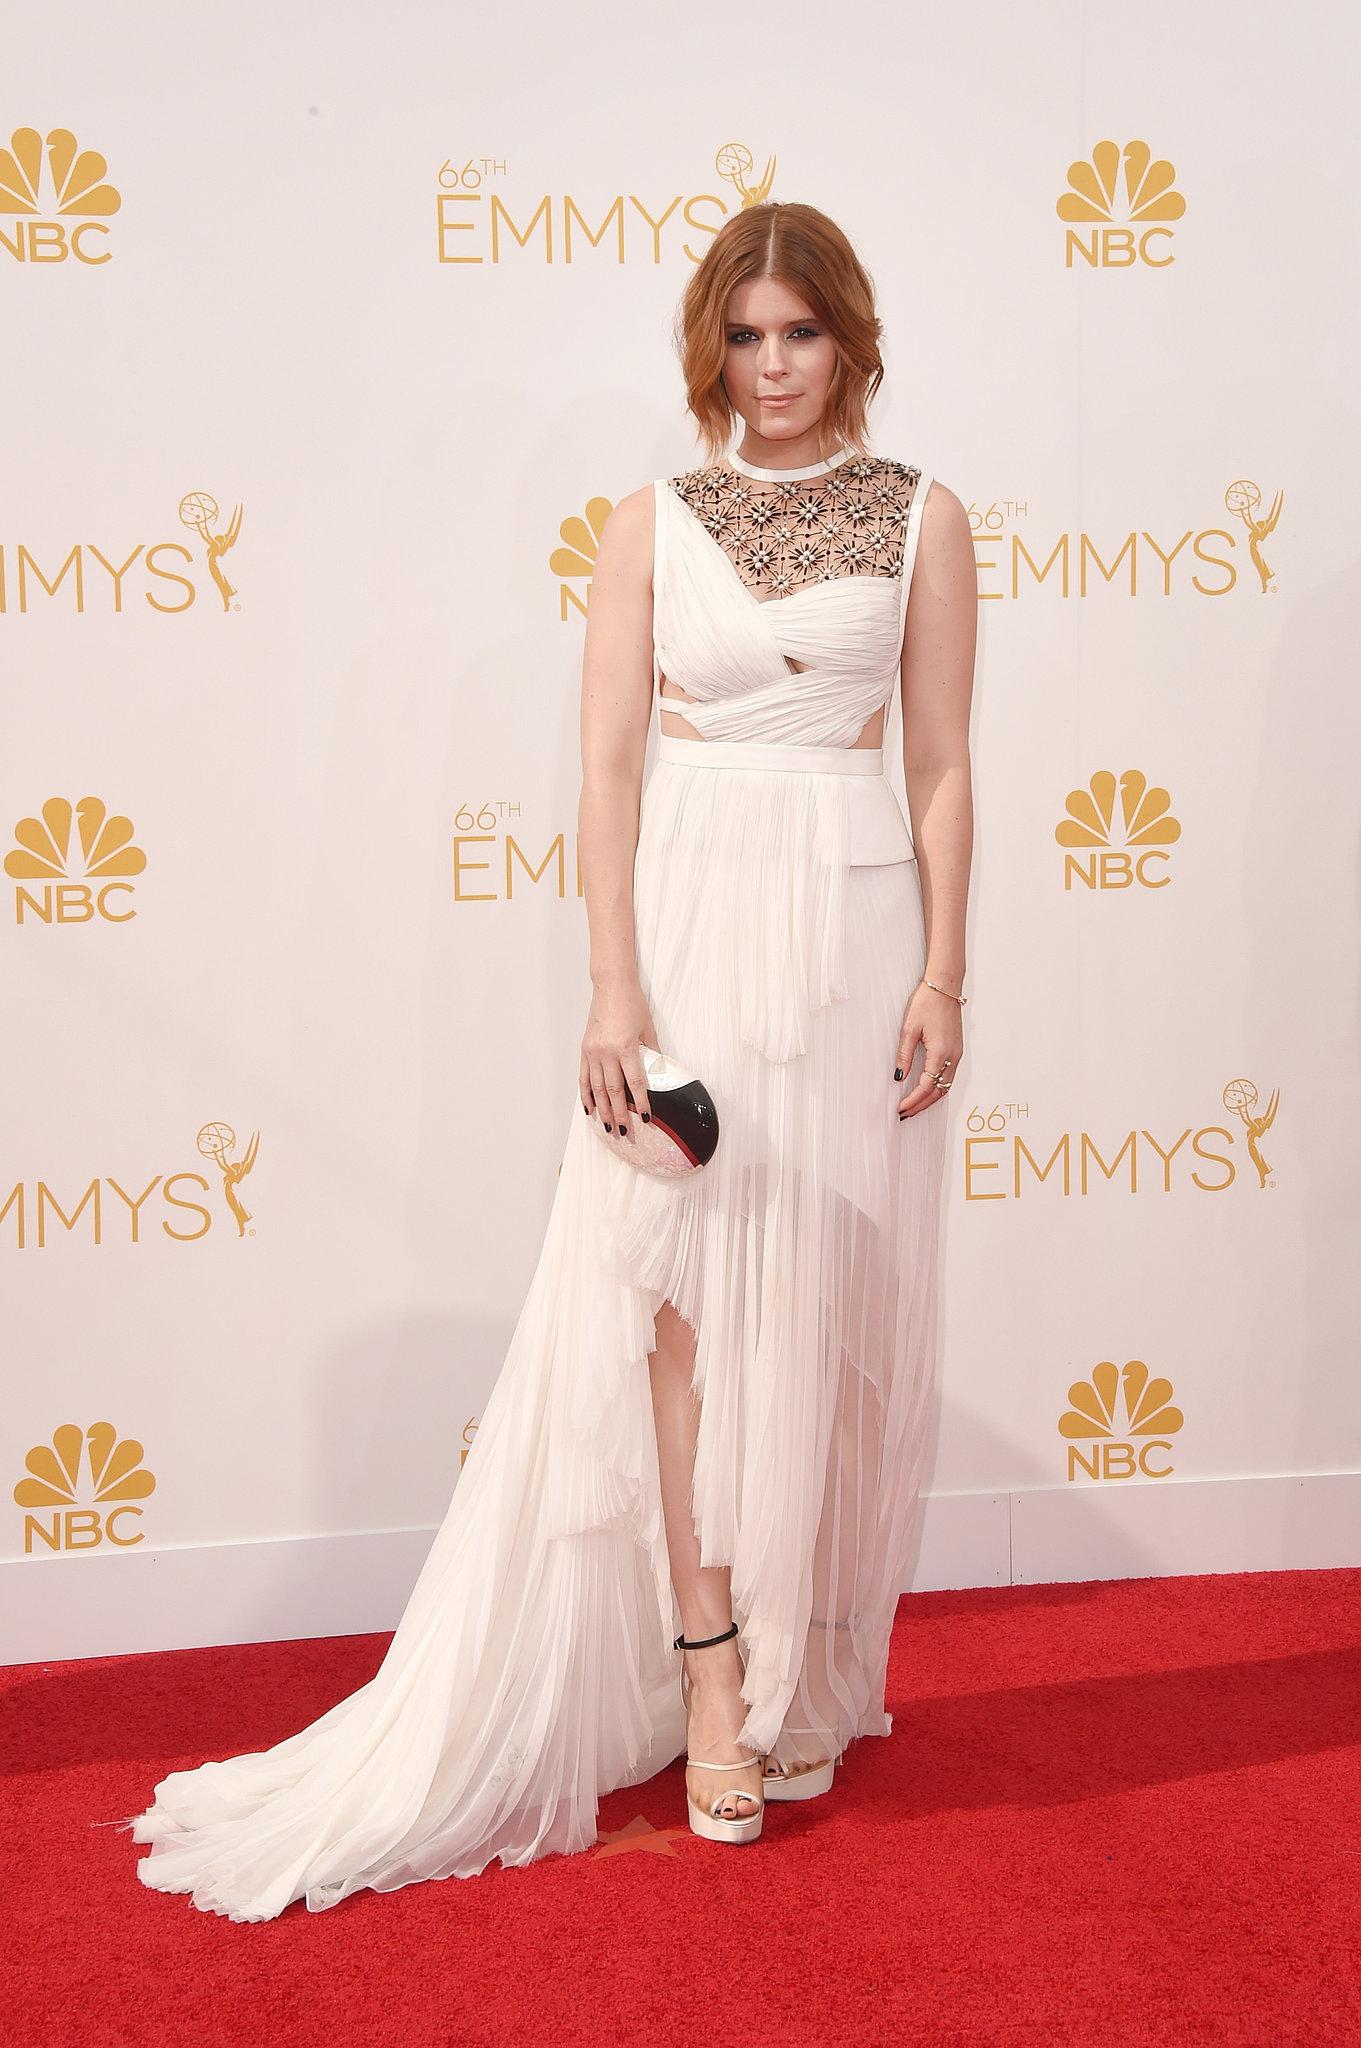 Kate Mara in J. Mendel at the 2014 Emmy Awards